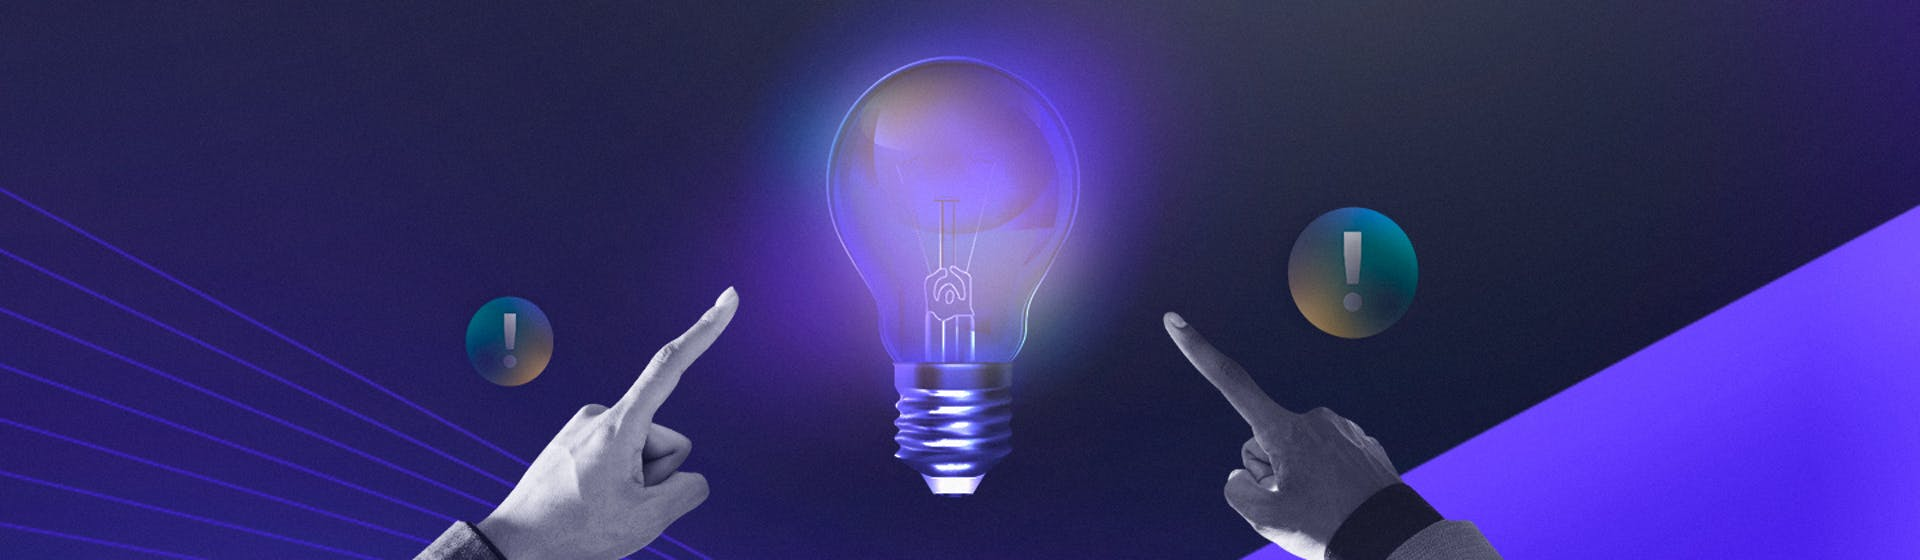 15 maneras de buscar ideas de contenidos para tu estrategia digital ¡Cautiva a tu público!